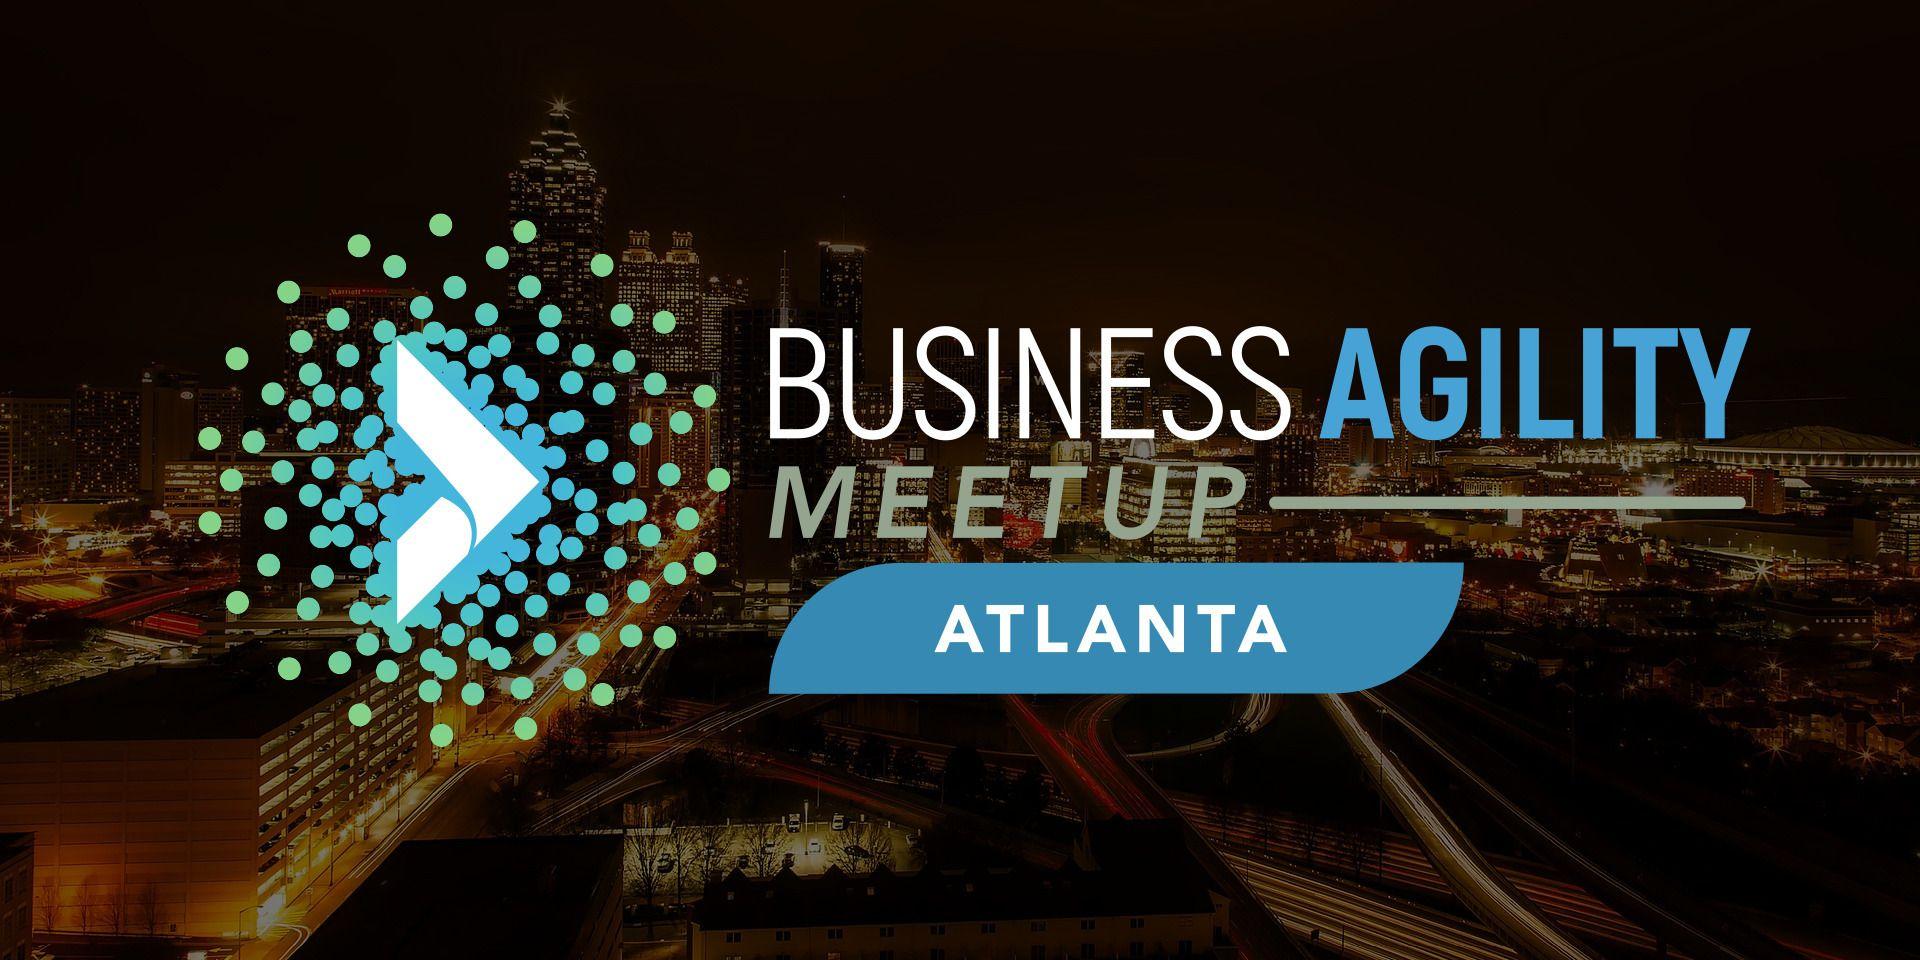 Business Agility Atlanta